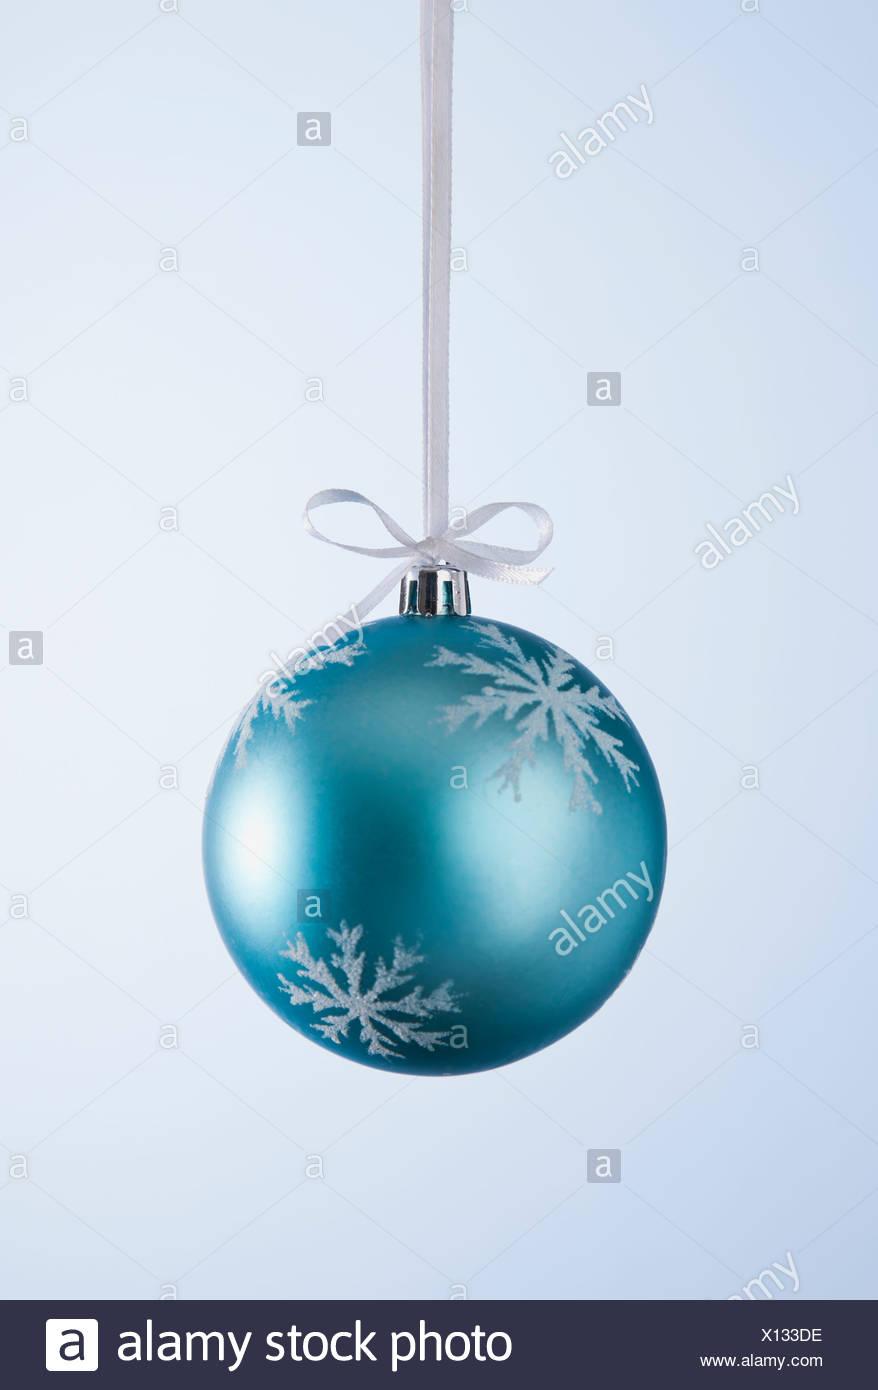 Studio shot of blue Christmas ornament hanging on ribbon - Stock Image